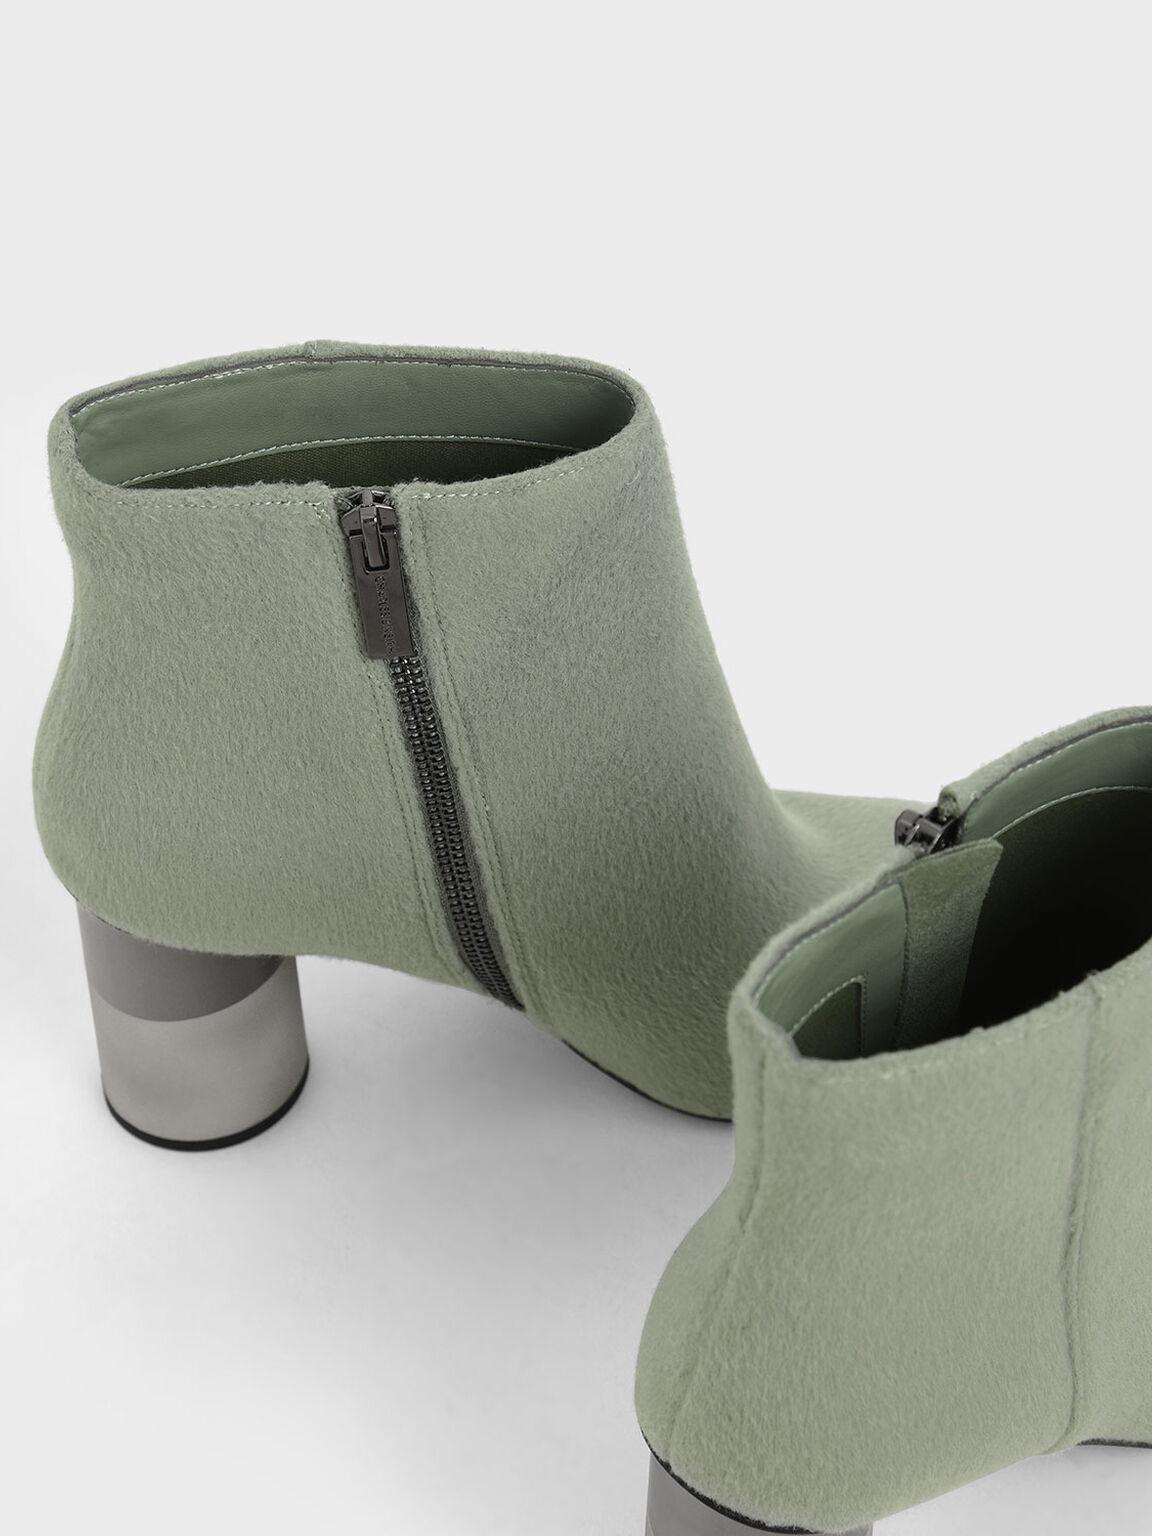 Concrete Heel Felt Ankle Boots, Sage Green, hi-res